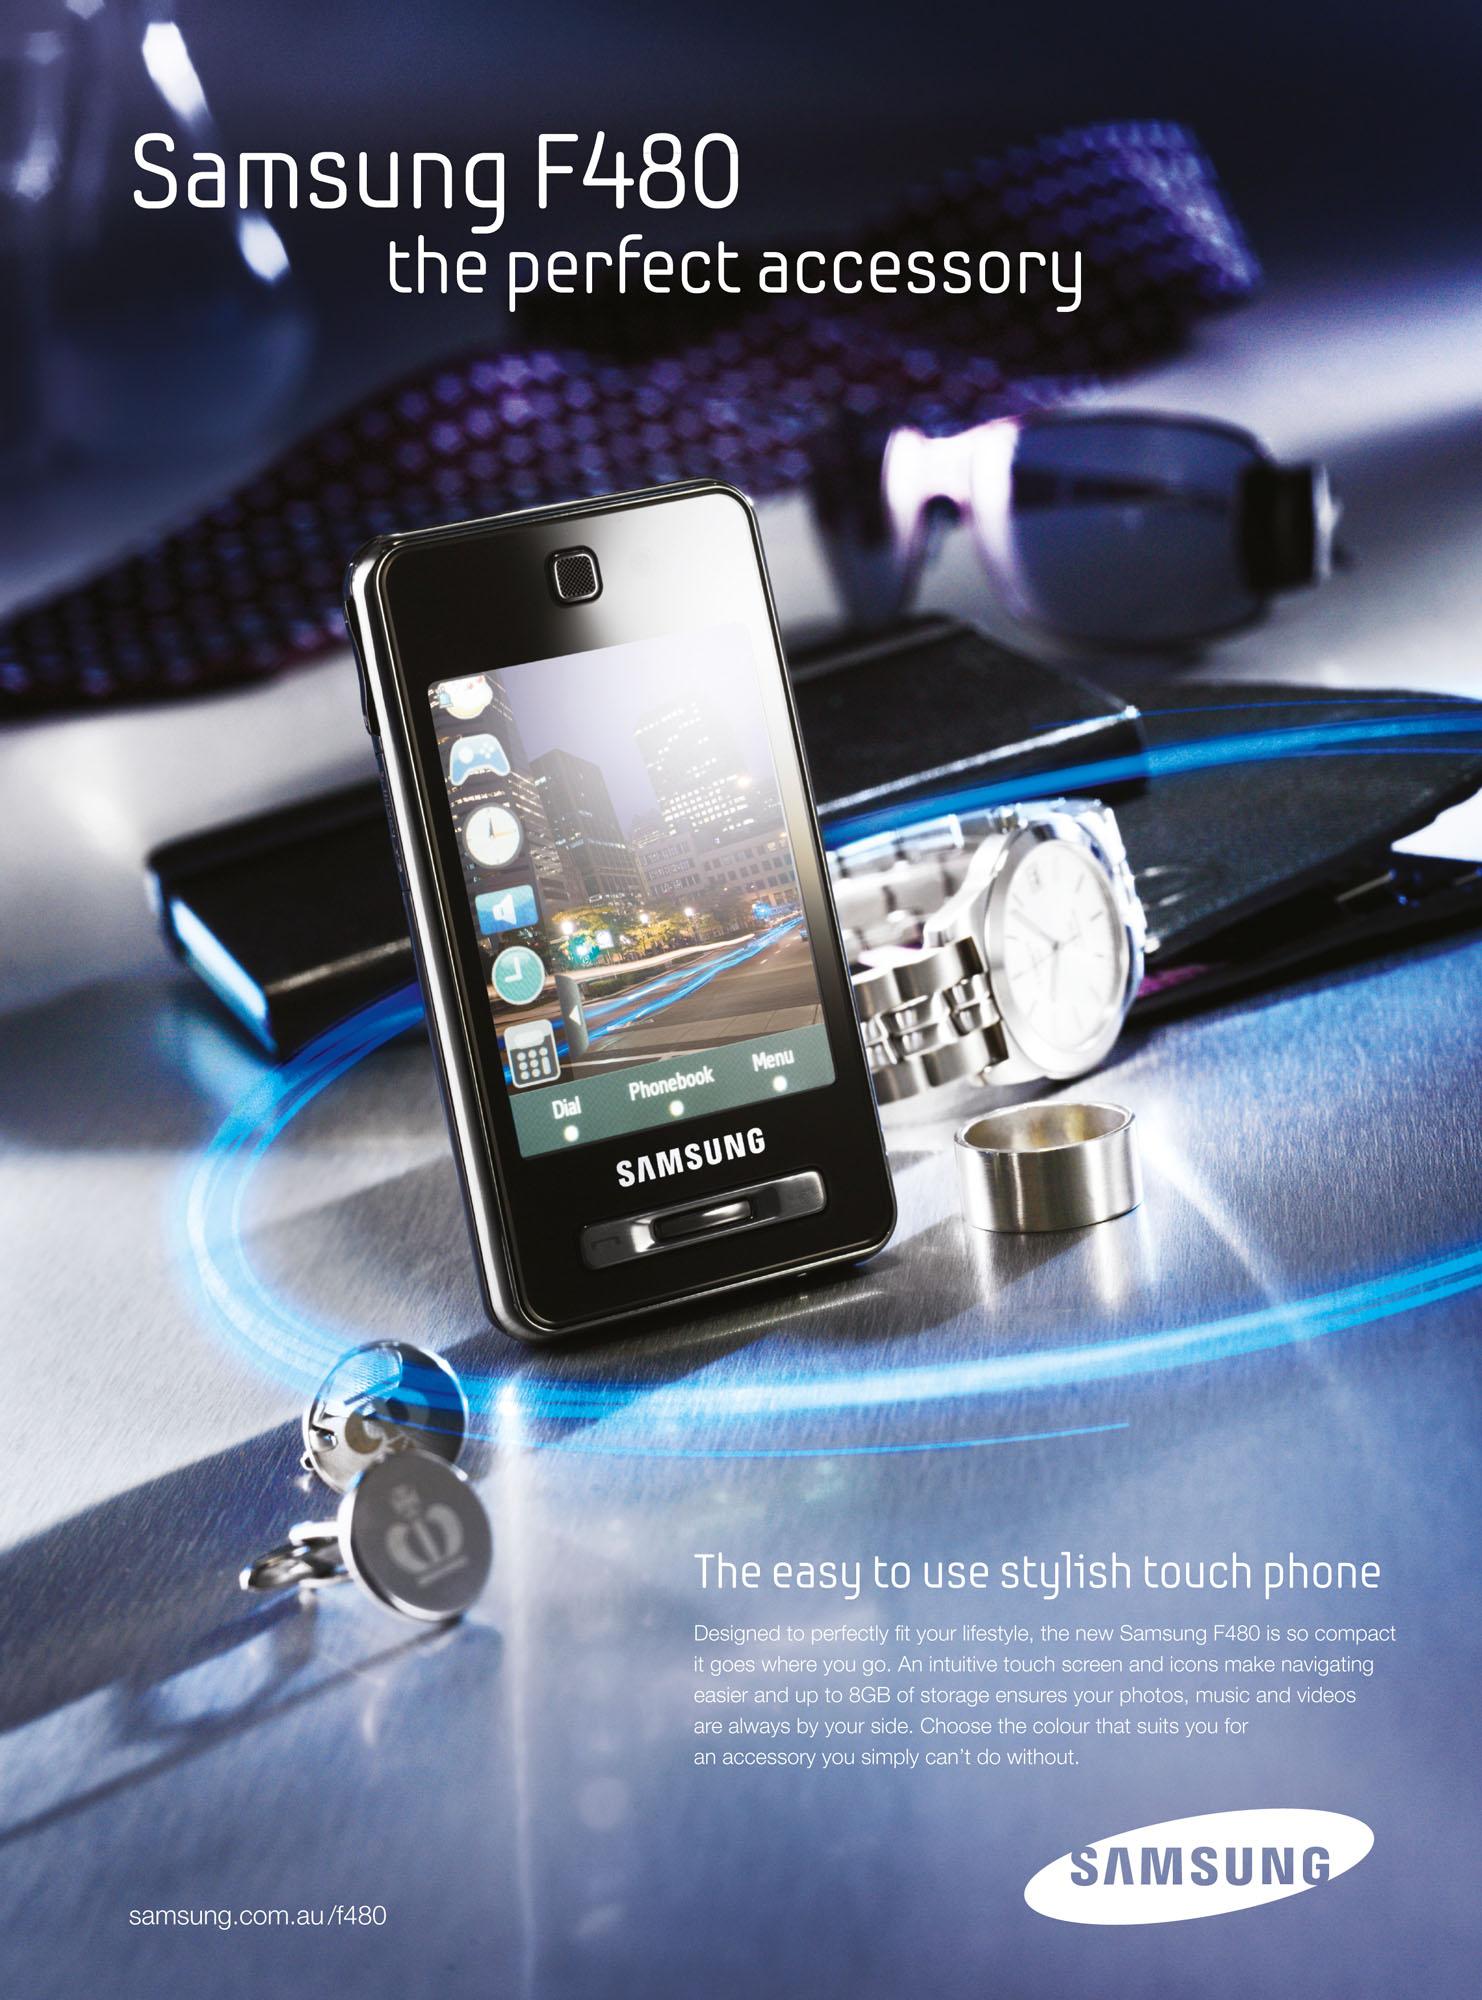 Leo-Burnett-Samsung-F480-GQ-Advert_Retouched.jpg